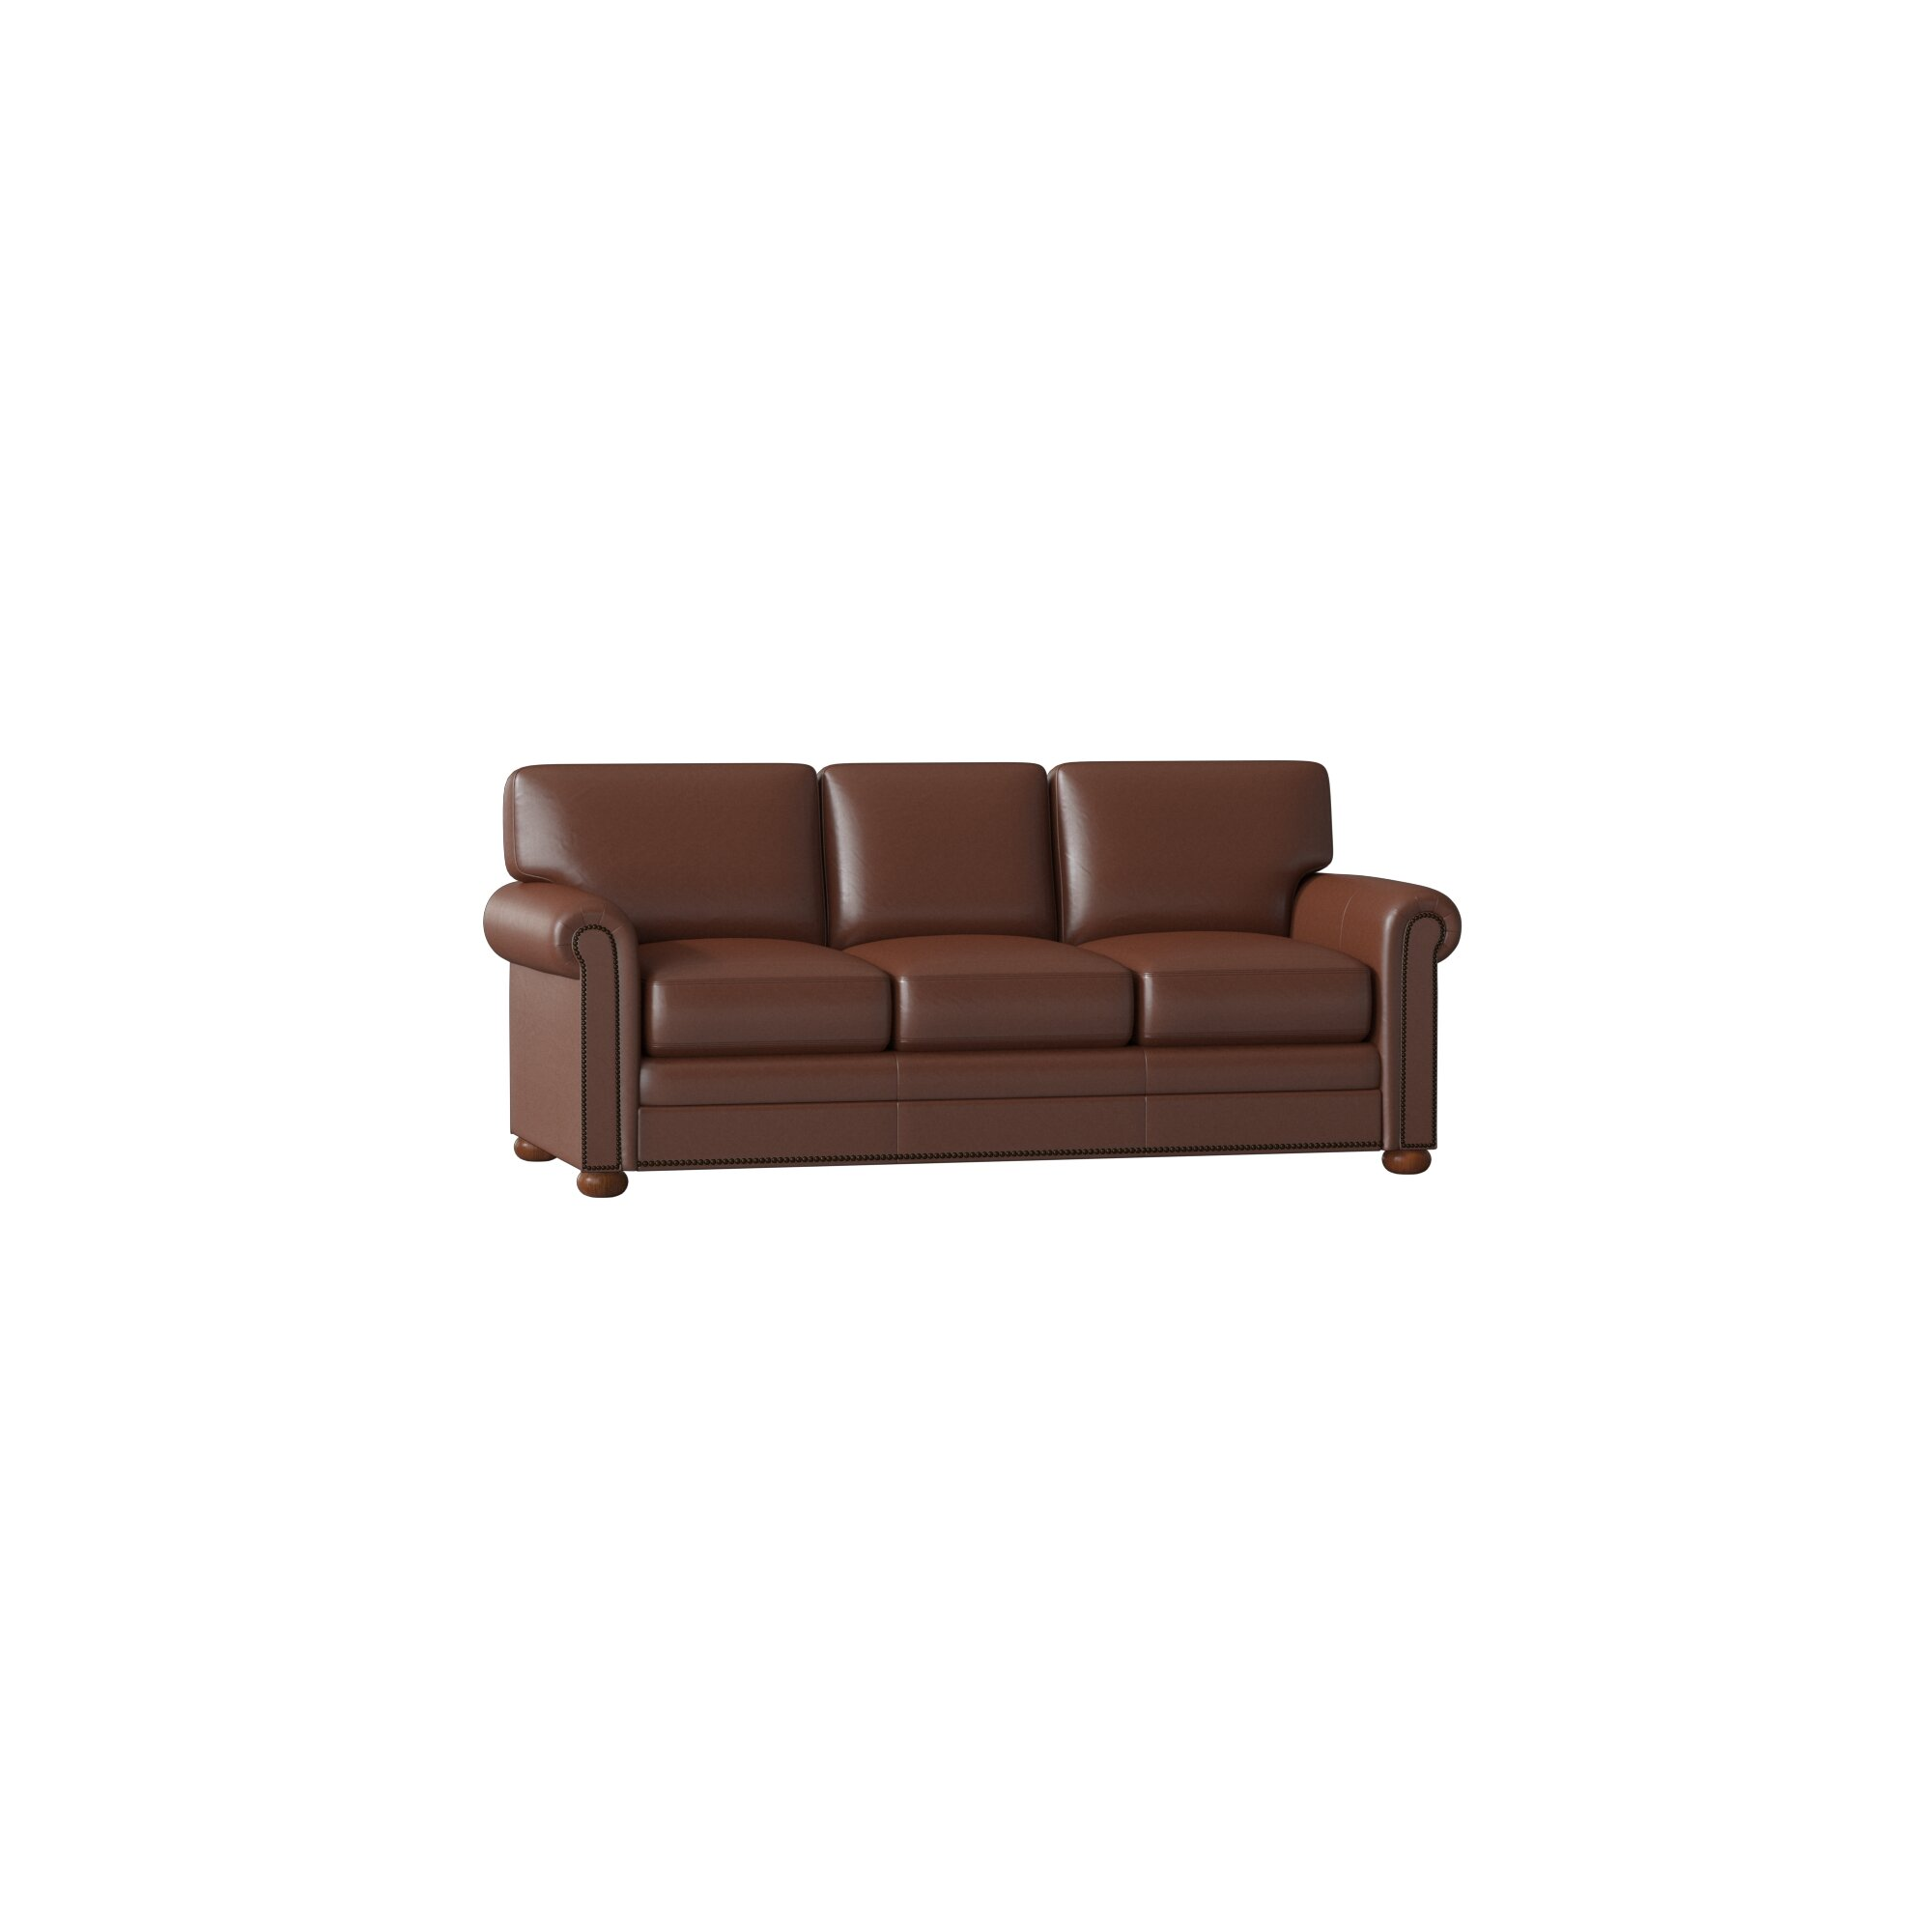 Savannah Sleeper Sofa